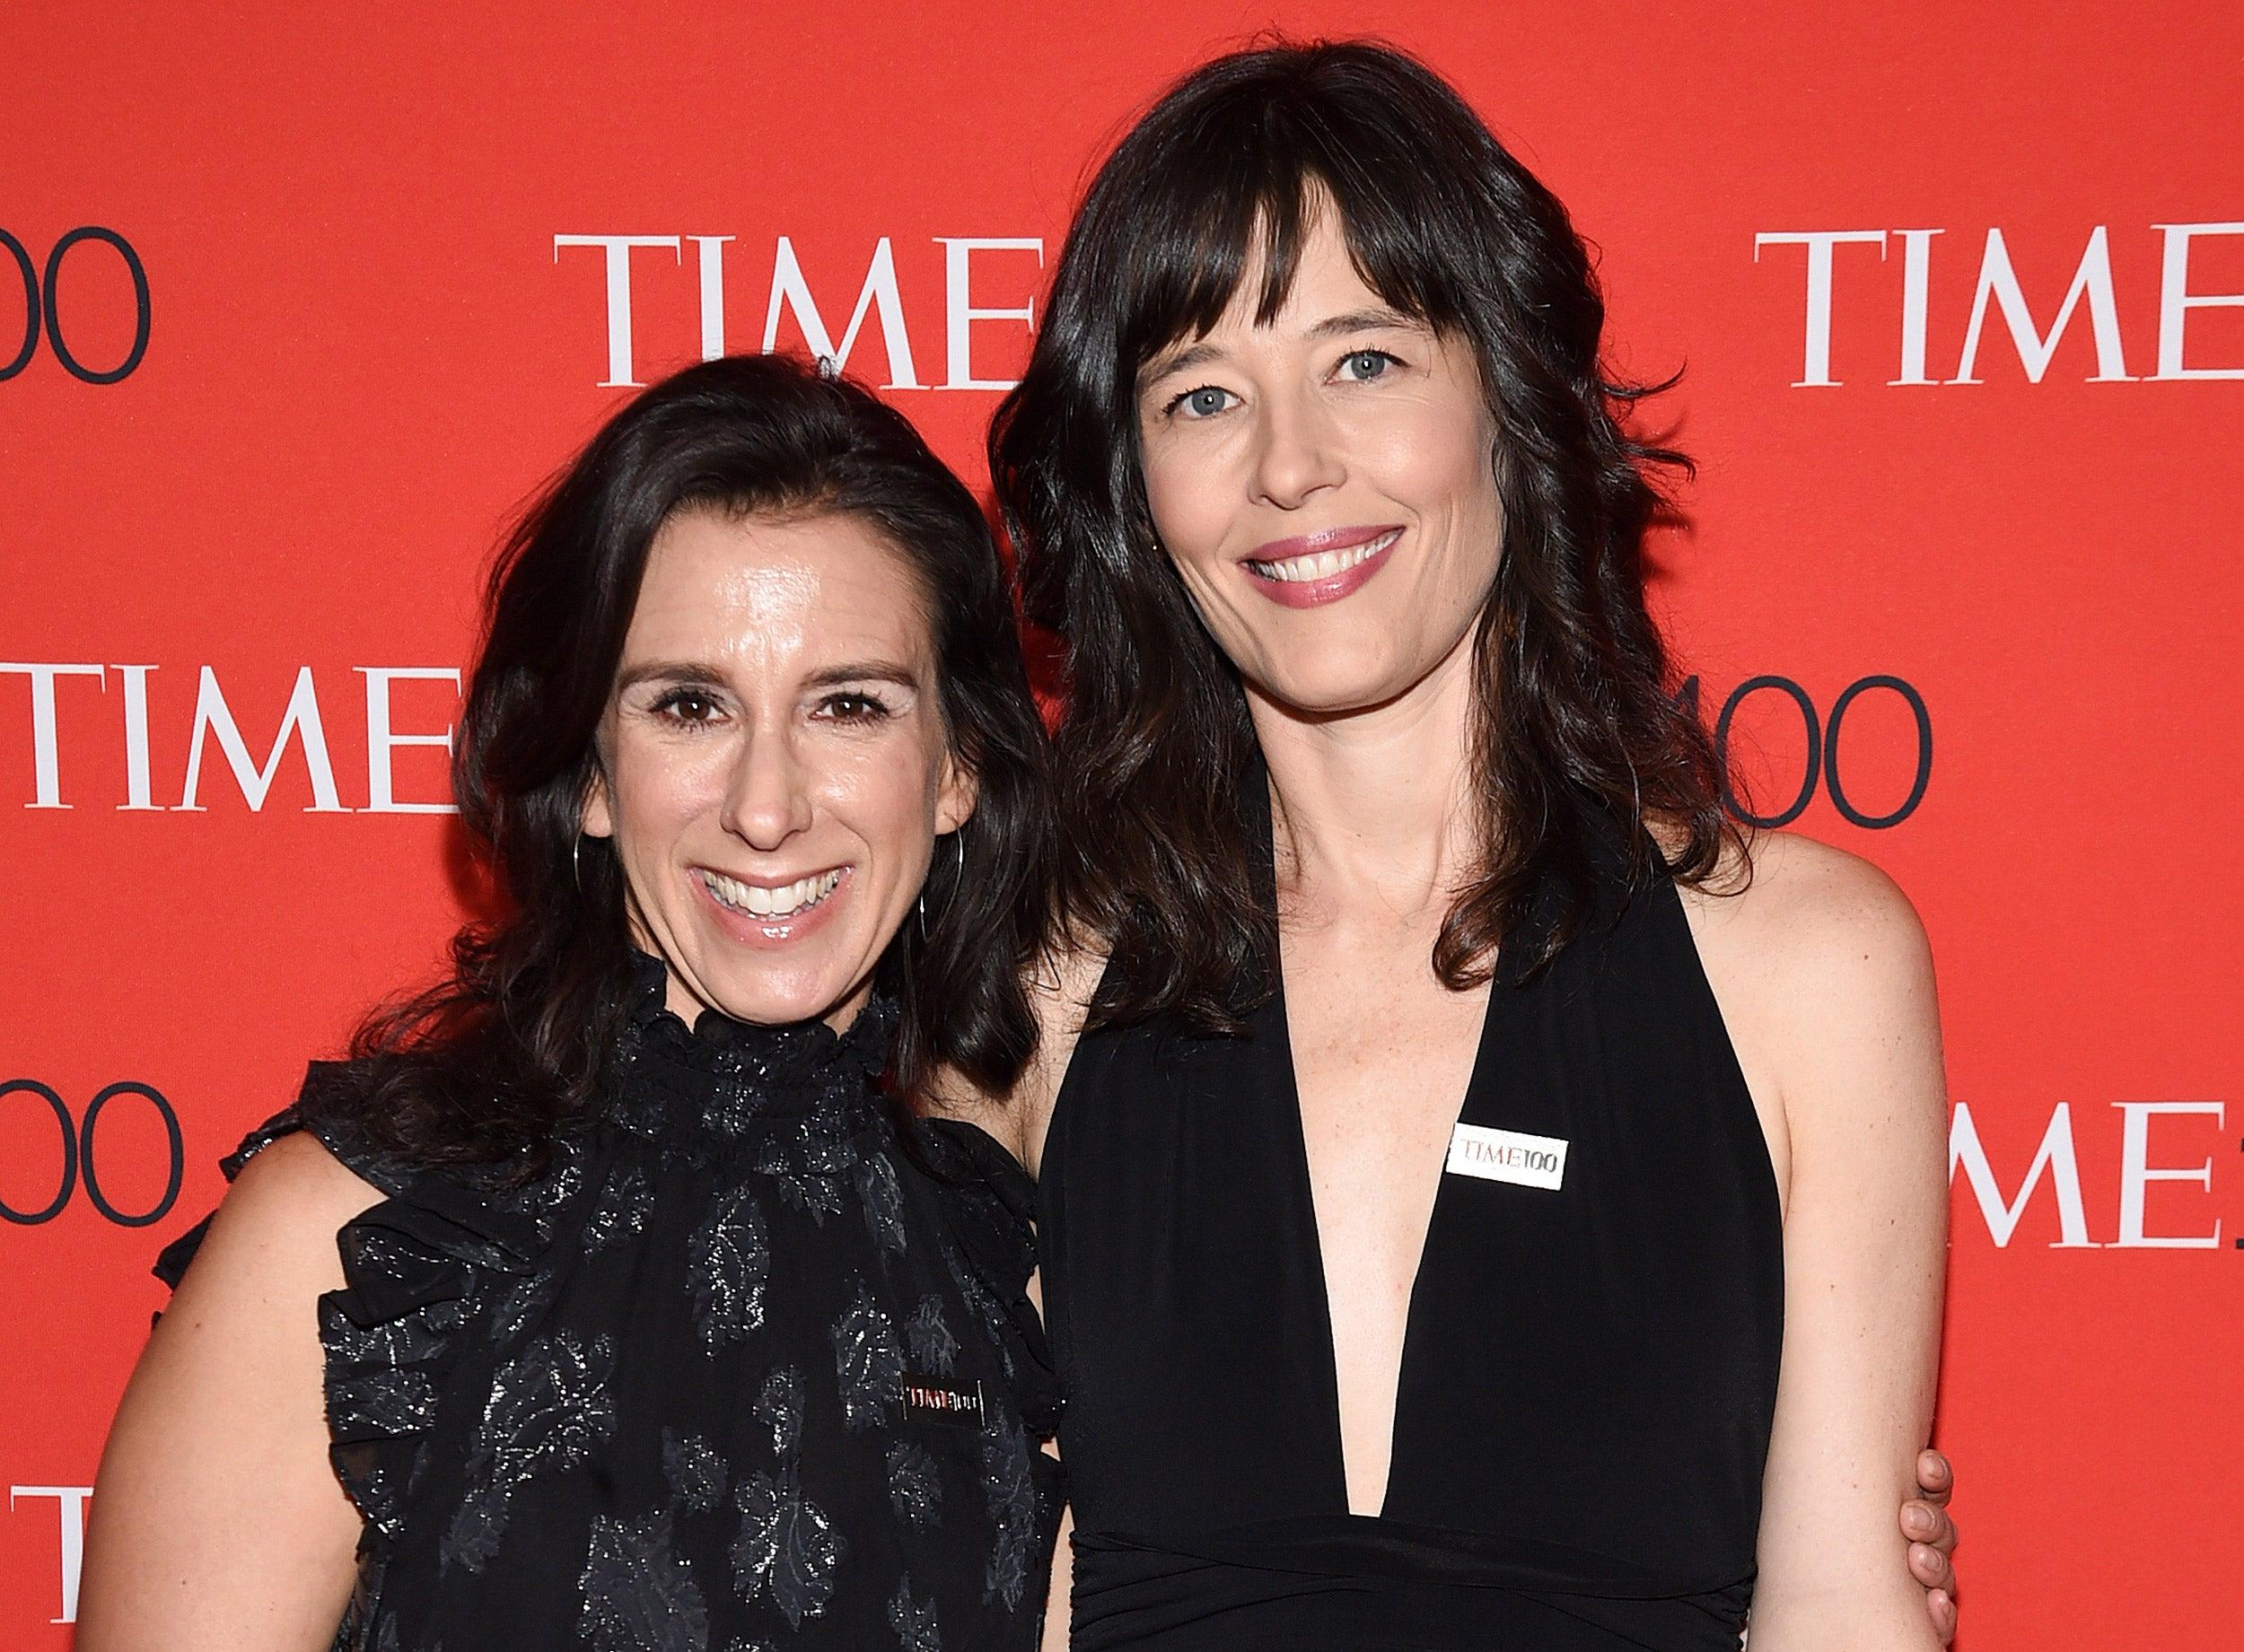 Journalists Jodi Kantor and Megan Twohey